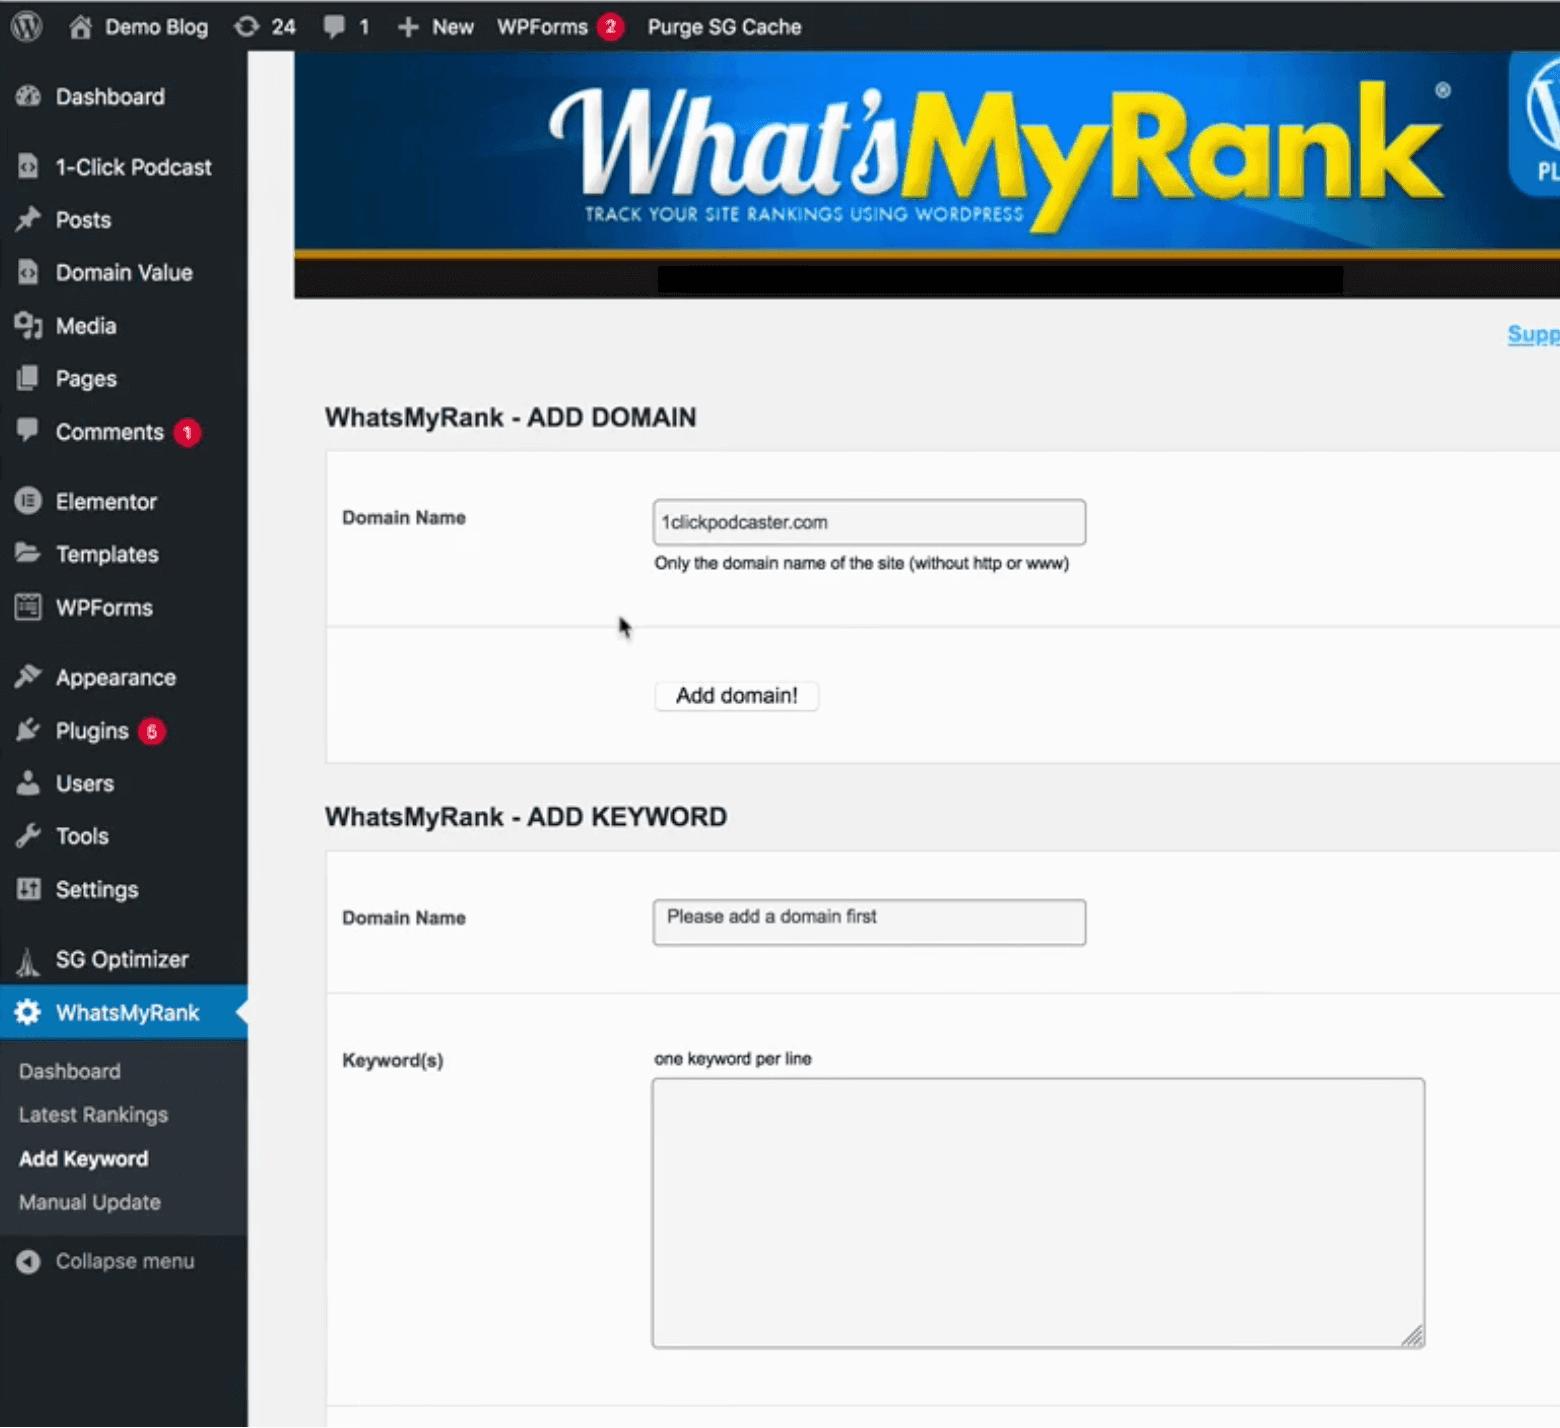 WhatsMyRank-software